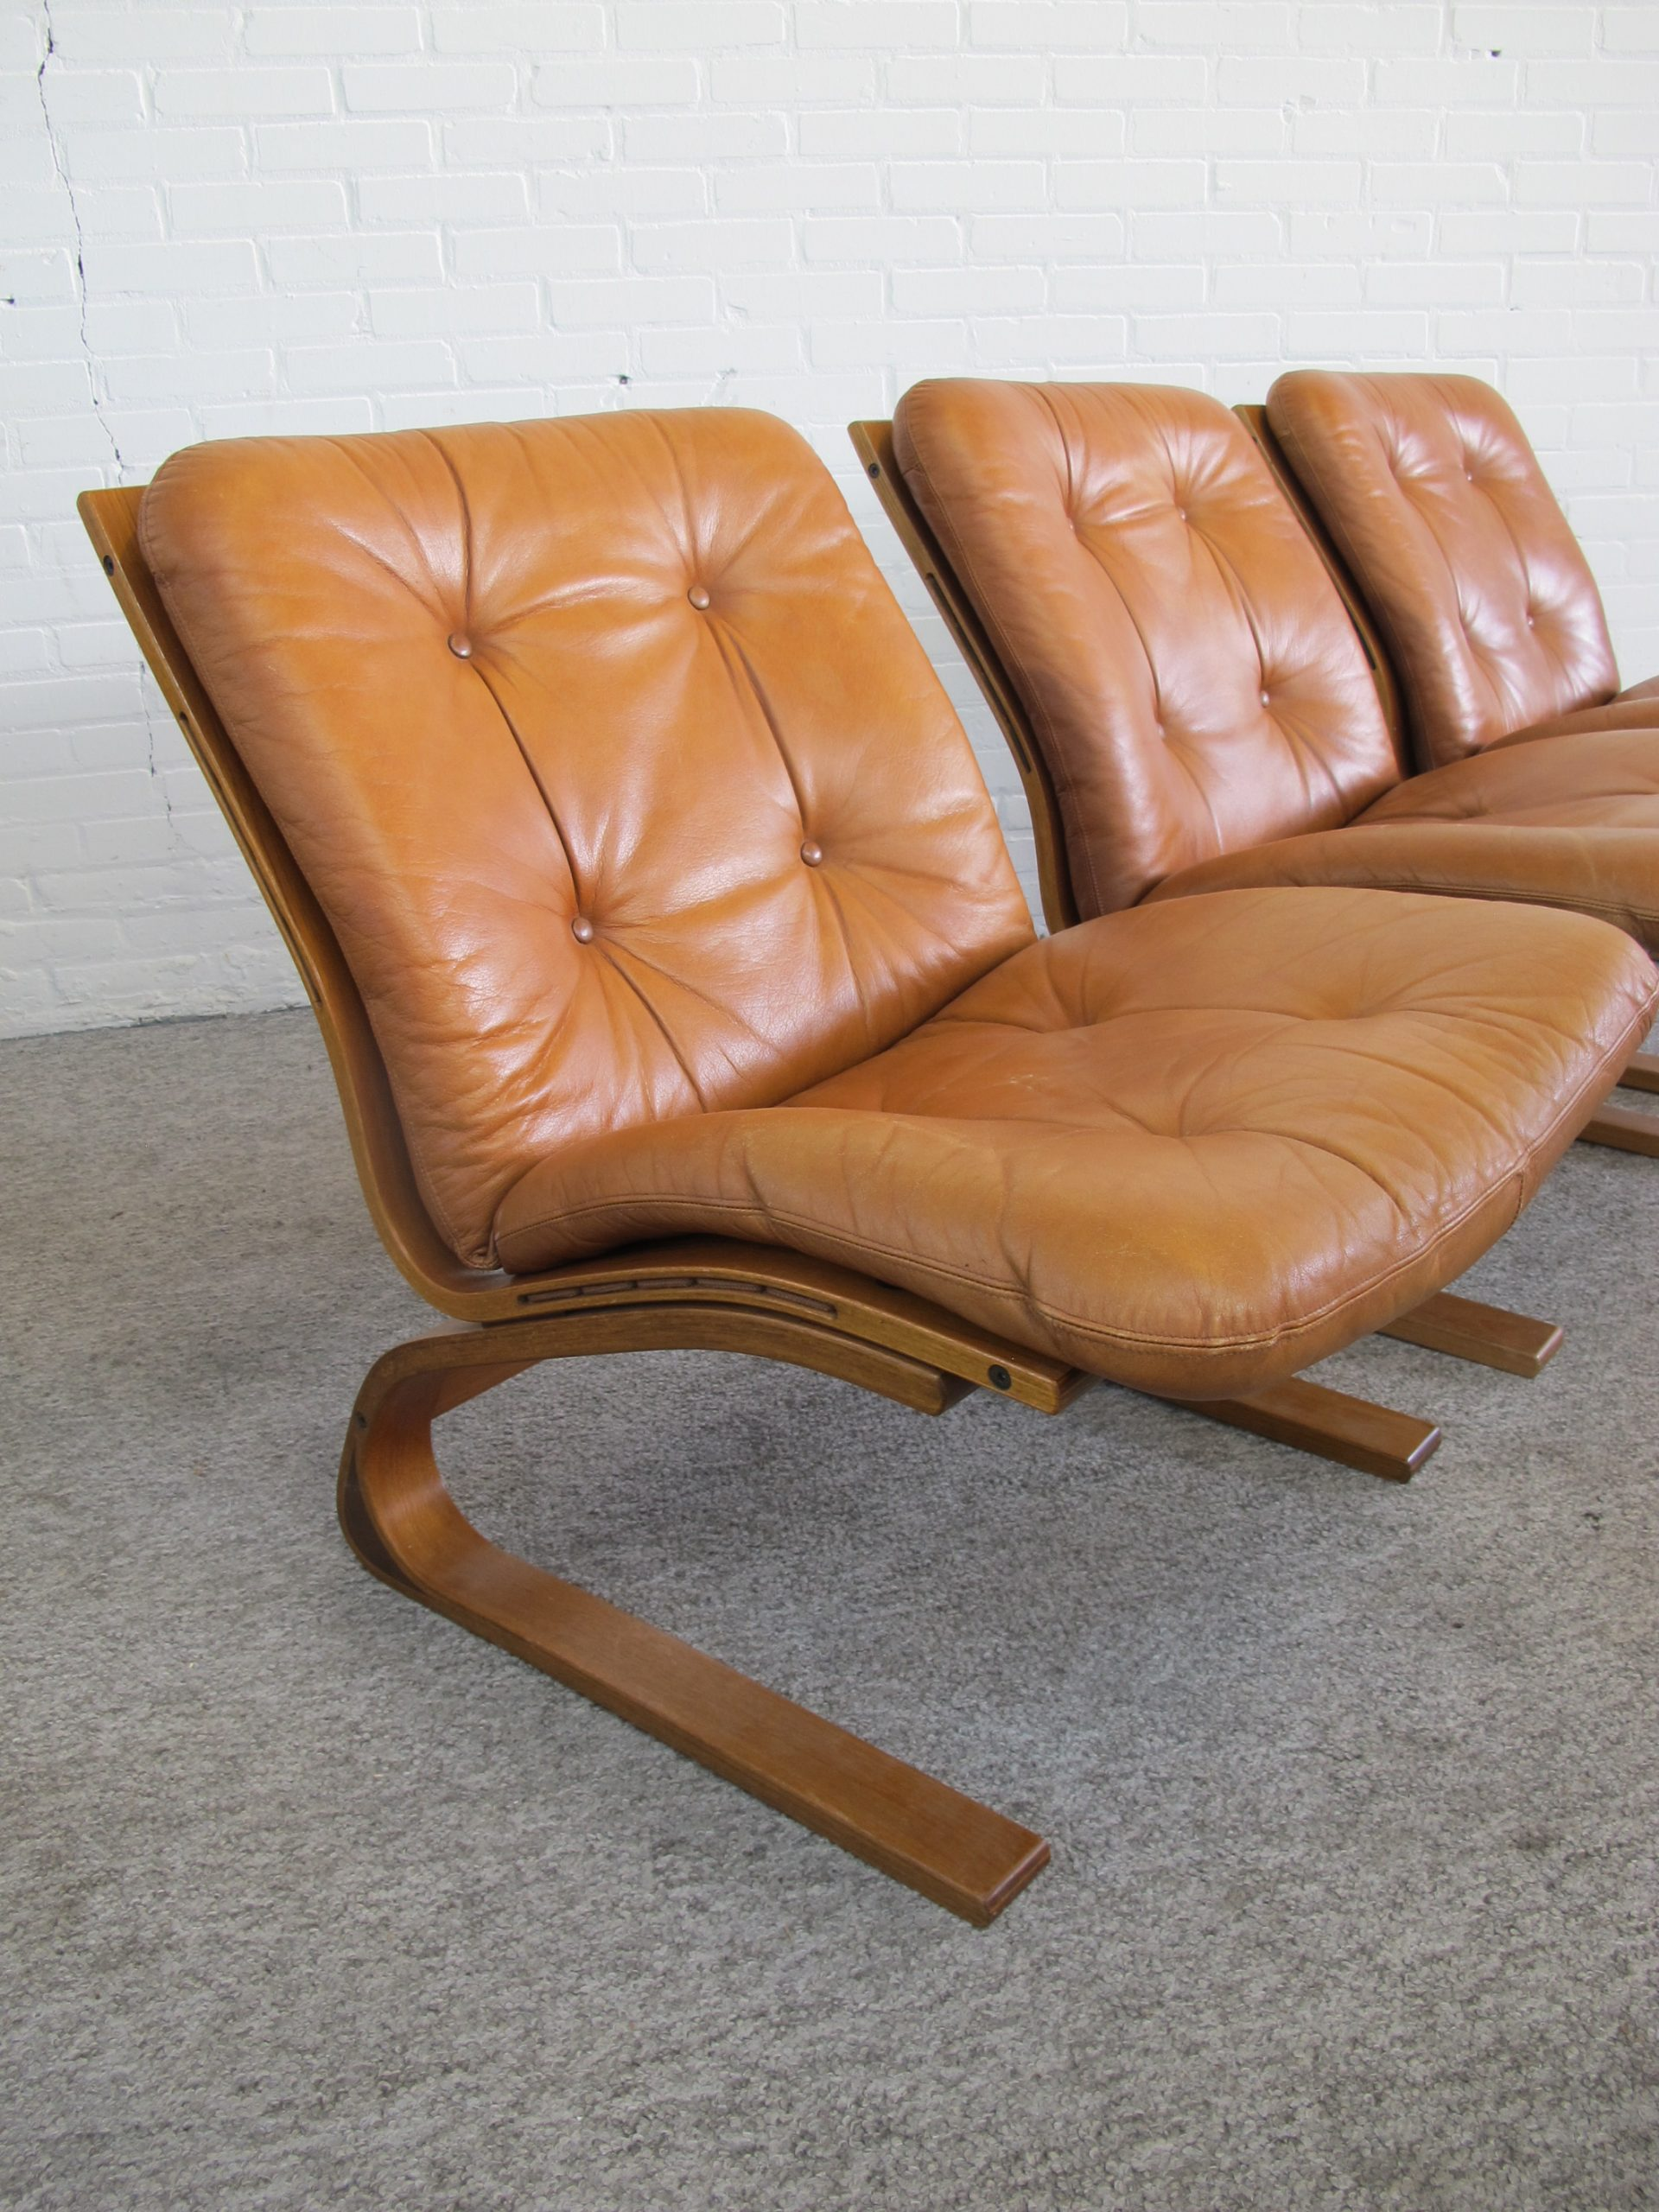 Fauteuil Kengu lounge Chairs Elsa & Nordahl Solheim Rybo Rykken vintage midcentury